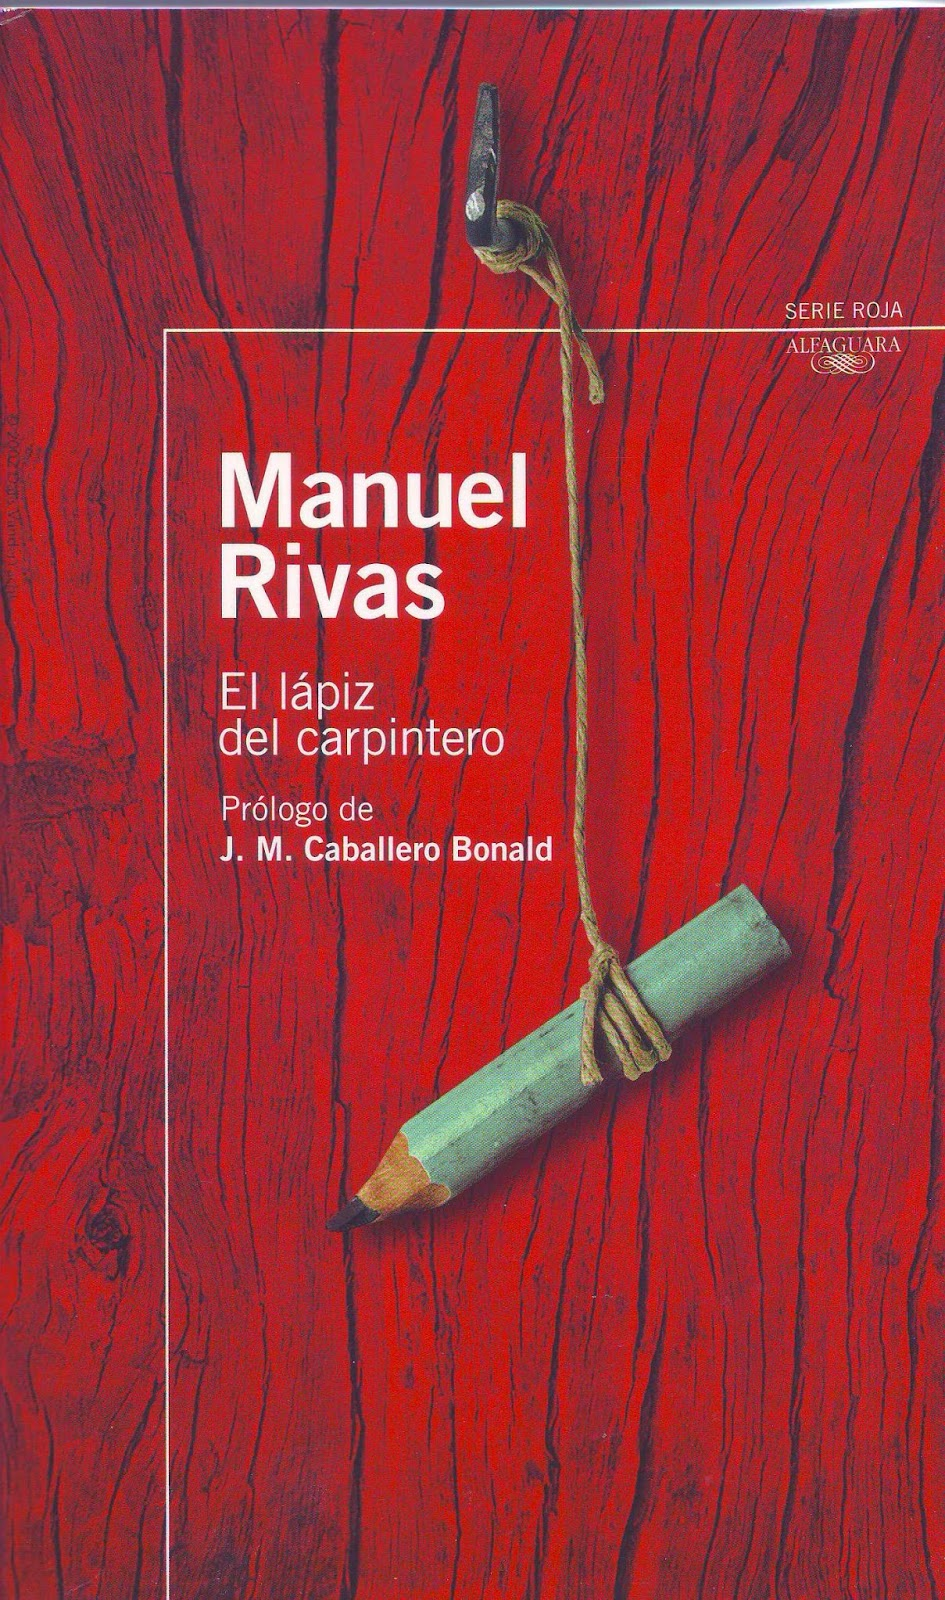 Blog del ies laguna de toll n el libro de la semana el - Carpinteros en santiago de compostela ...